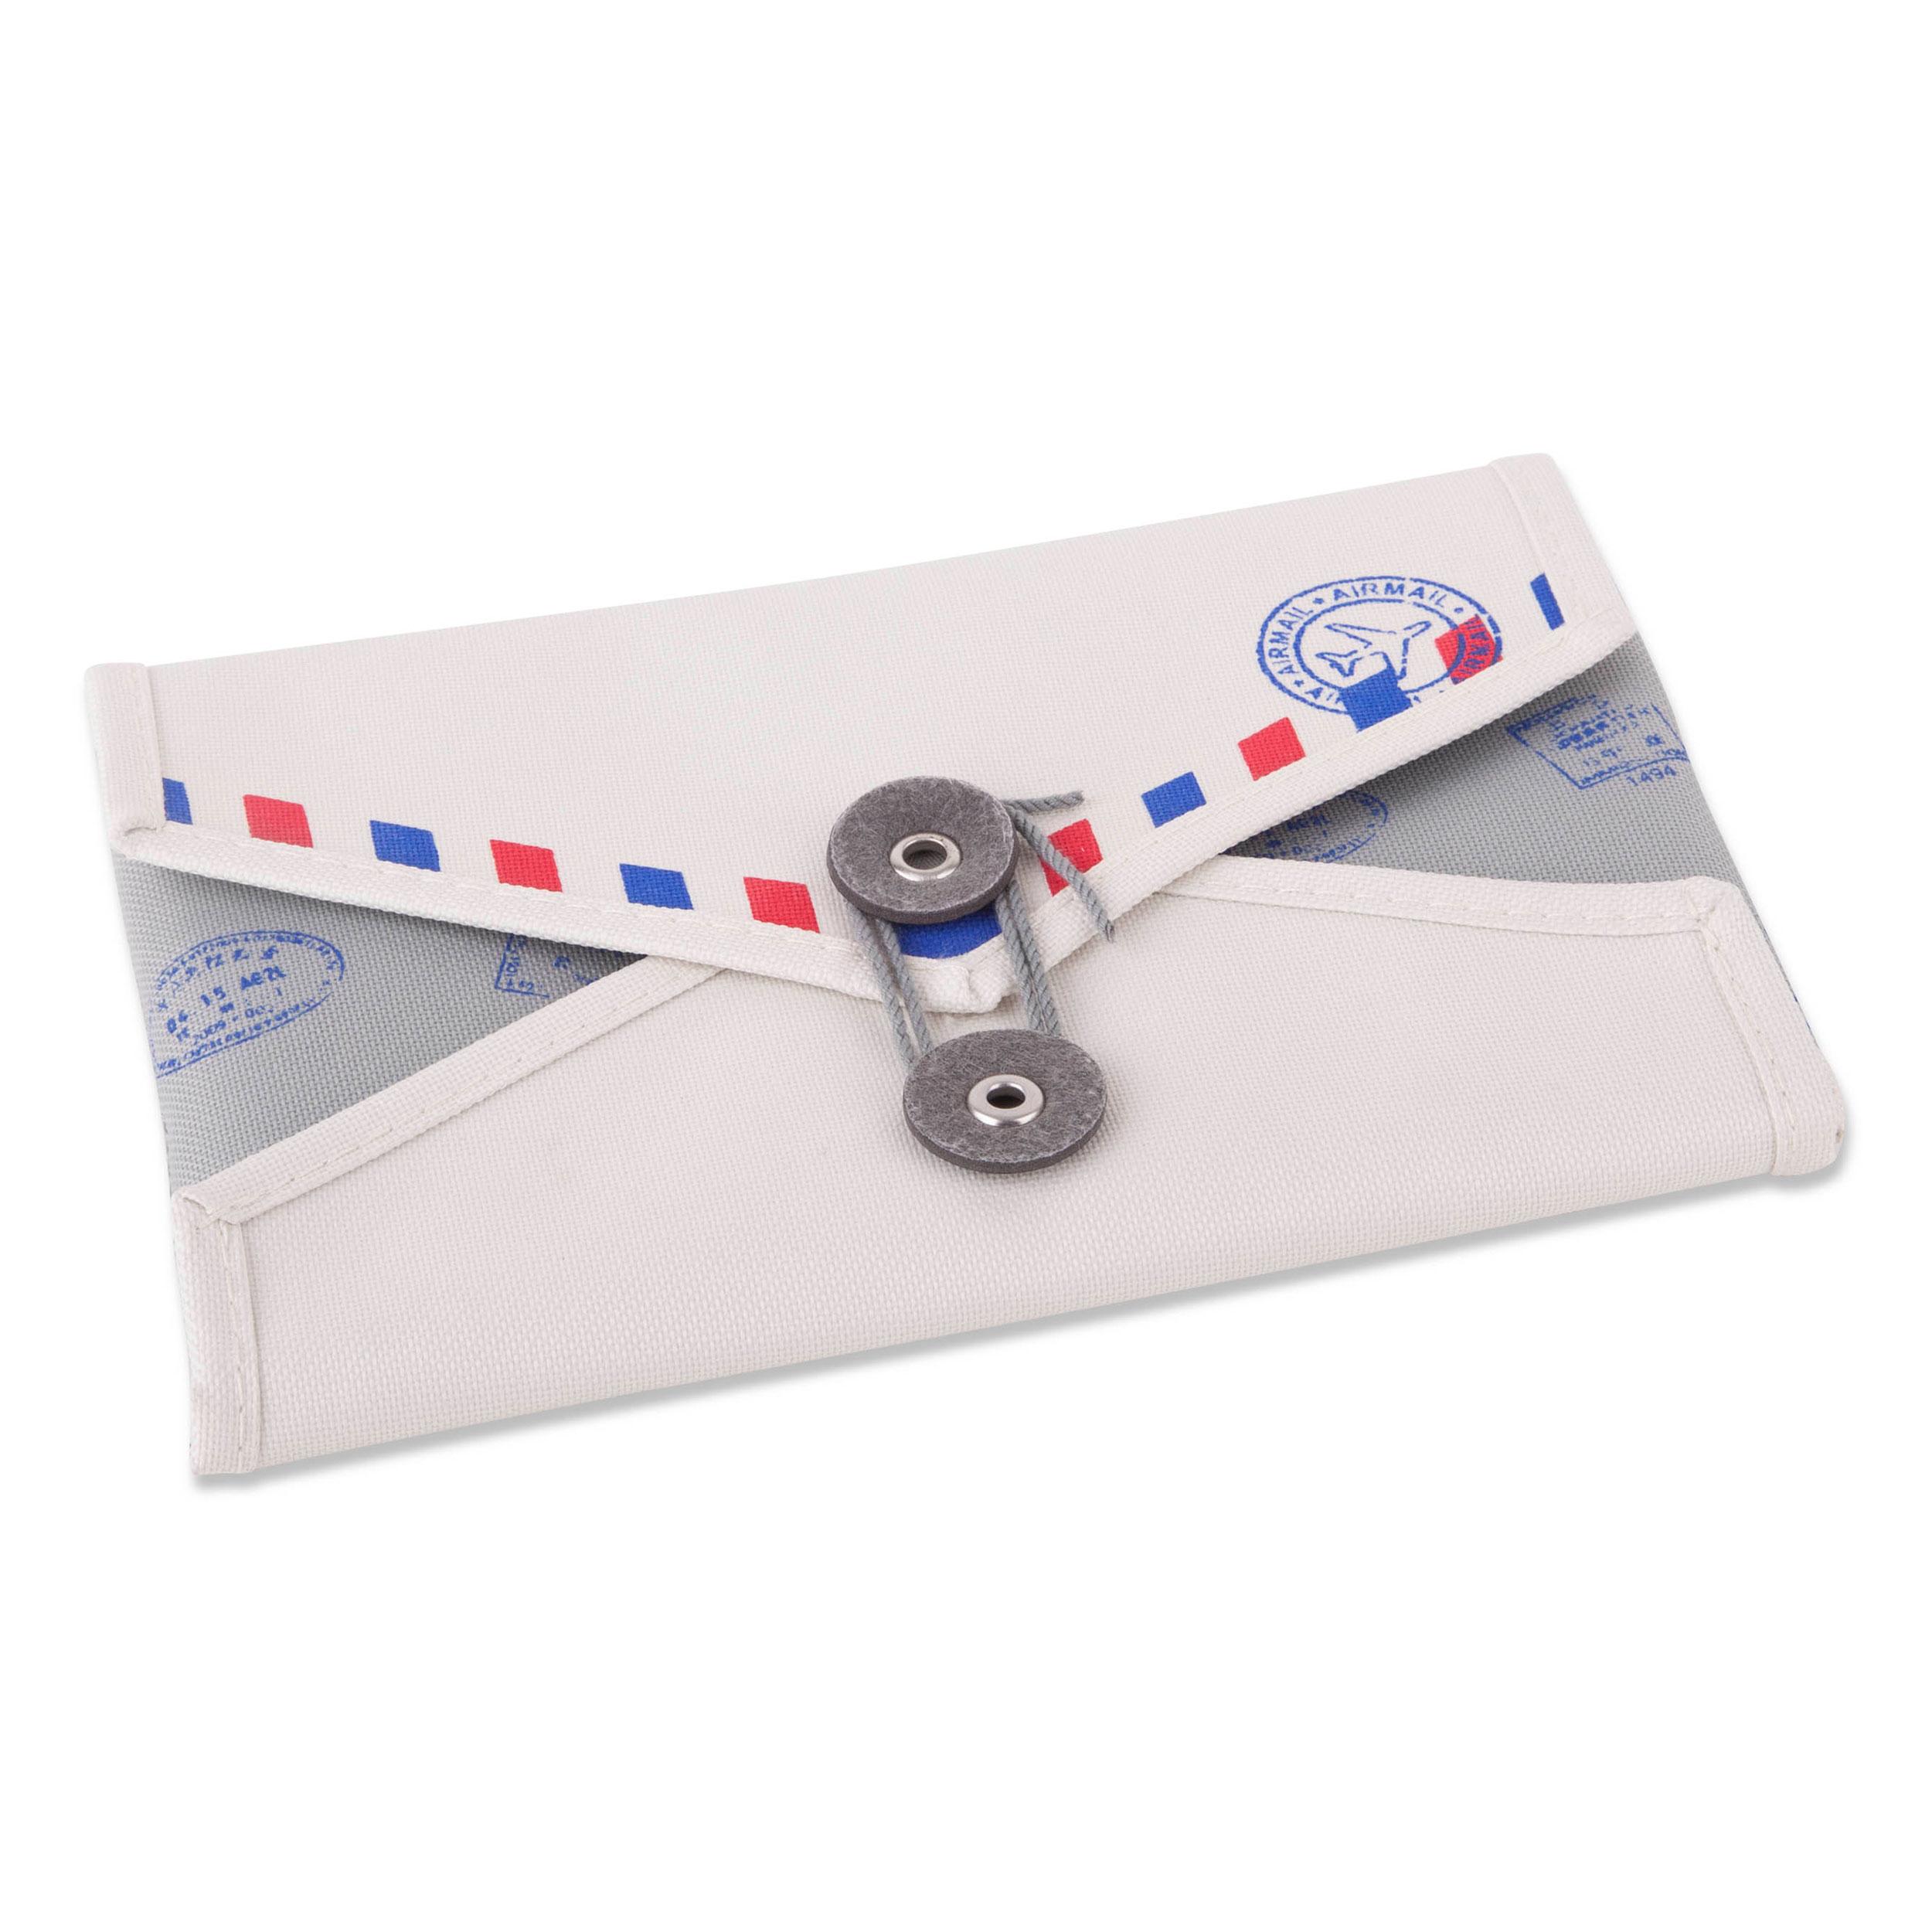 Reiseorganizer Envelope